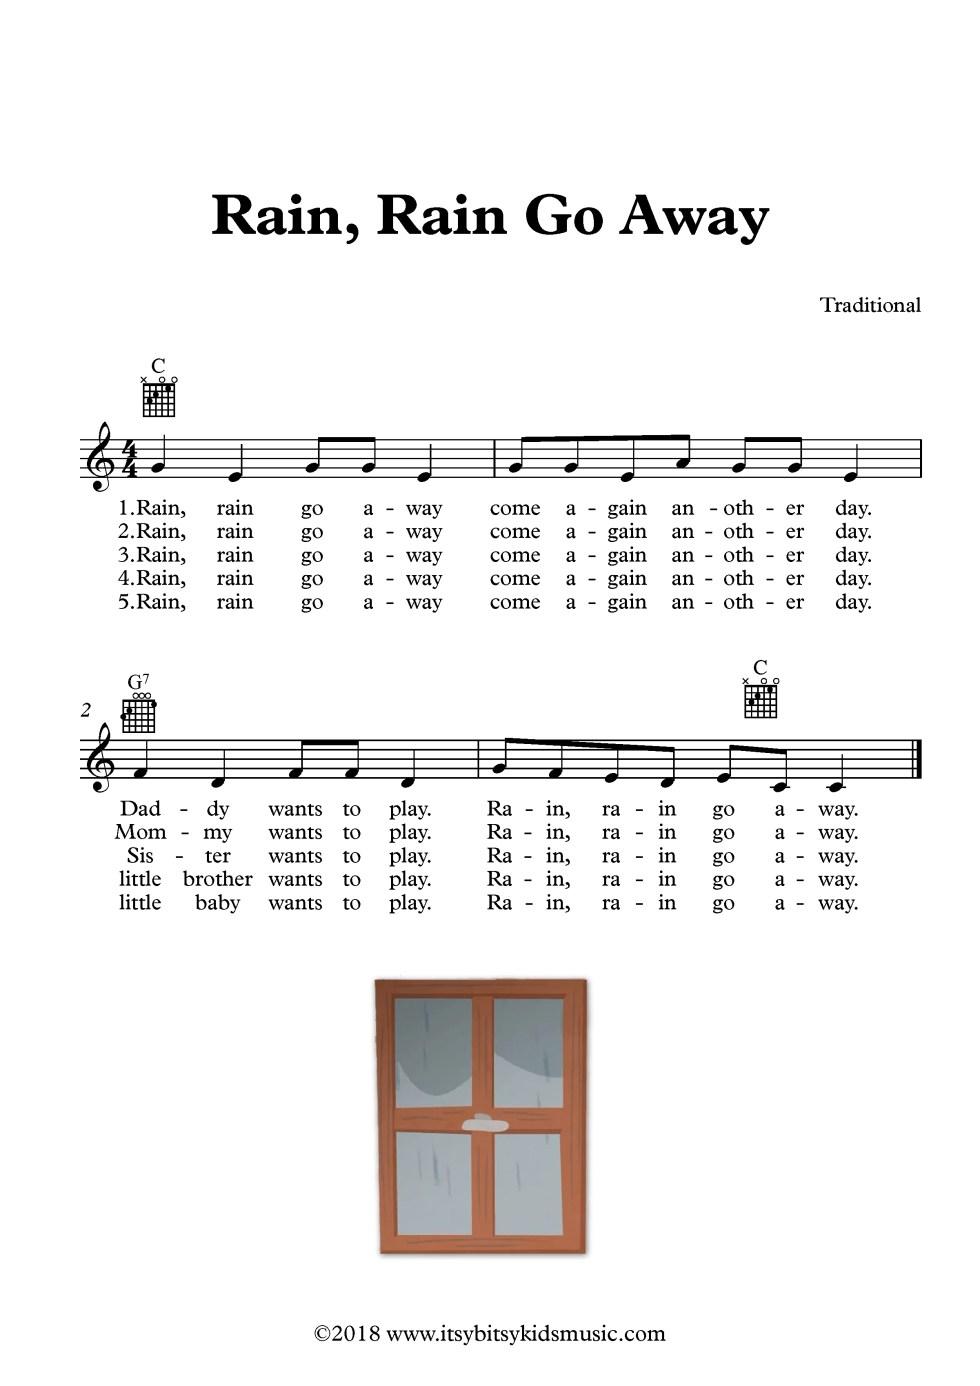 Rain Rain Go Away Song Sheet Music With Chords And Lyrics Itsy